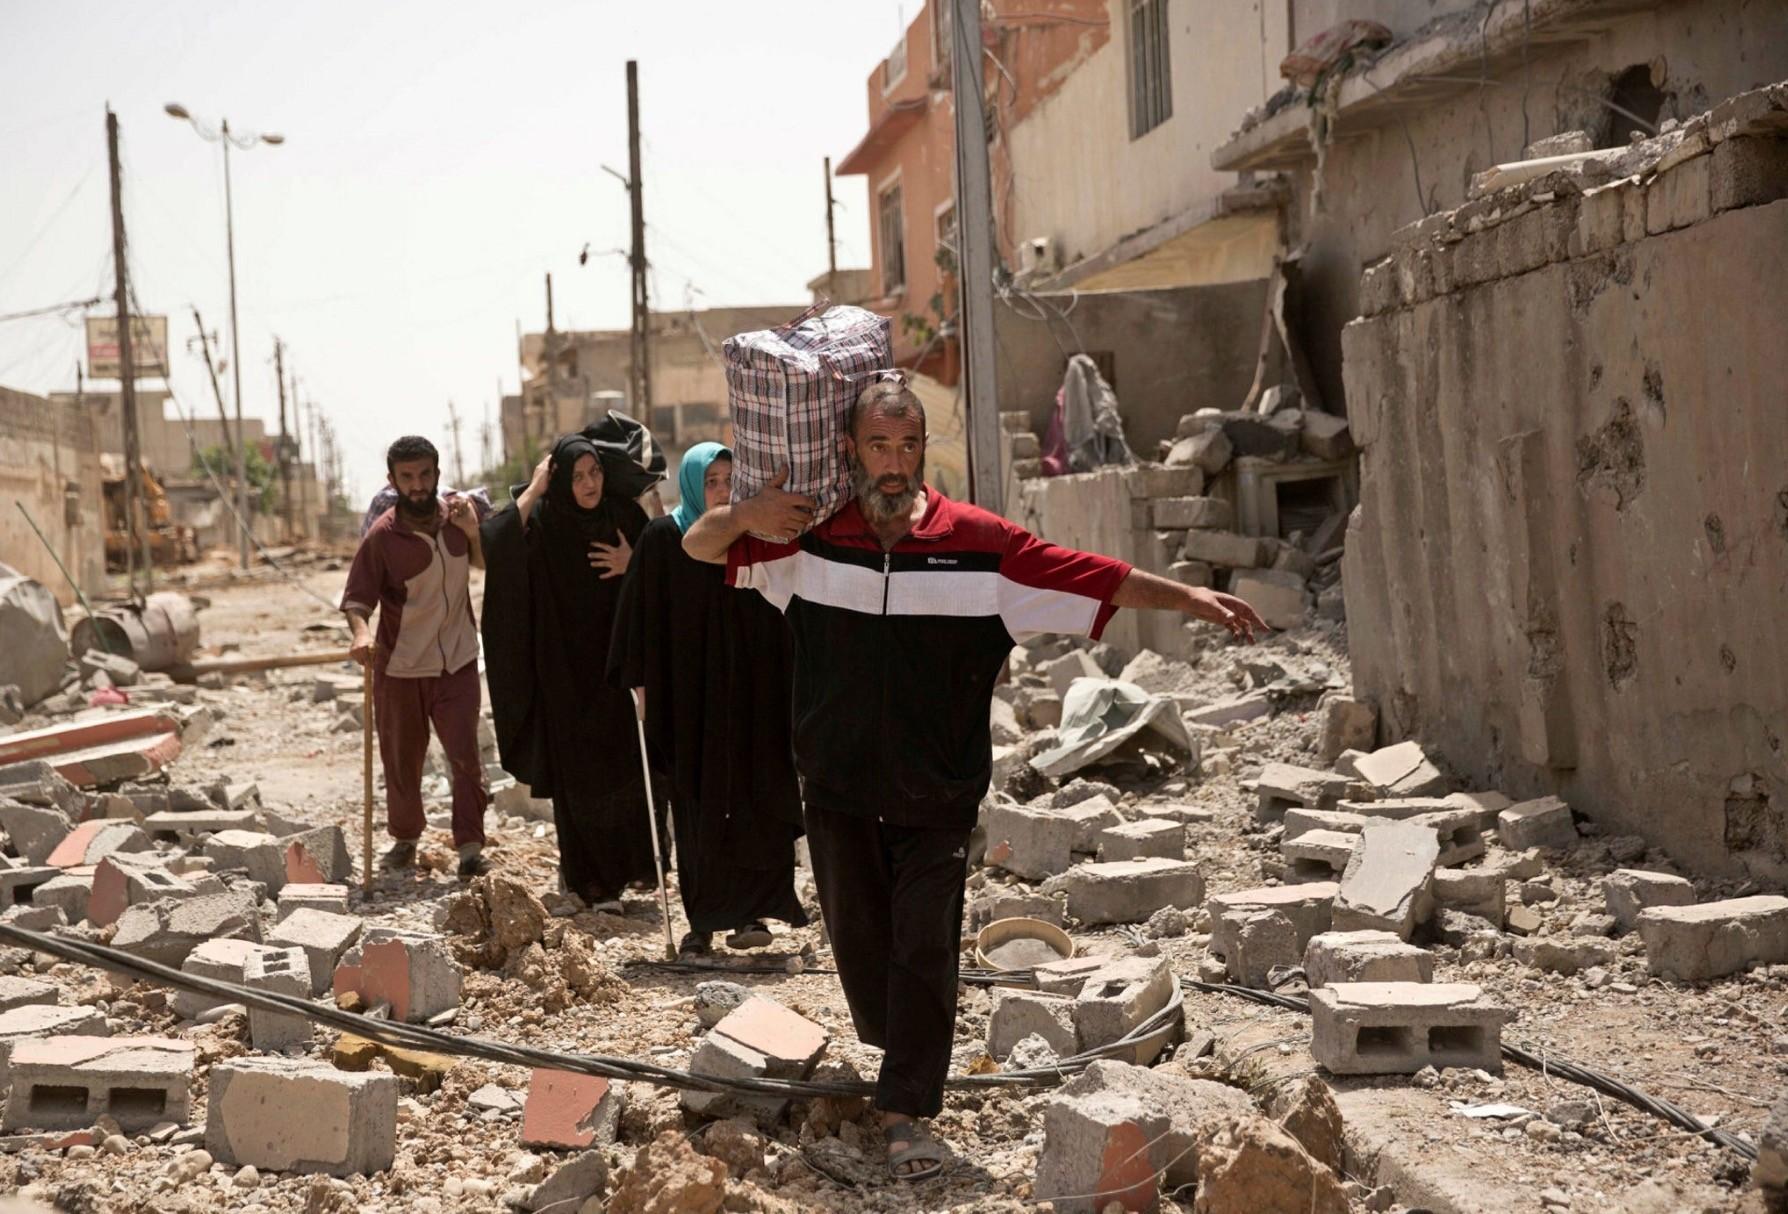 Iraqi civilians walk through the rubble of western Mosul, May 15.